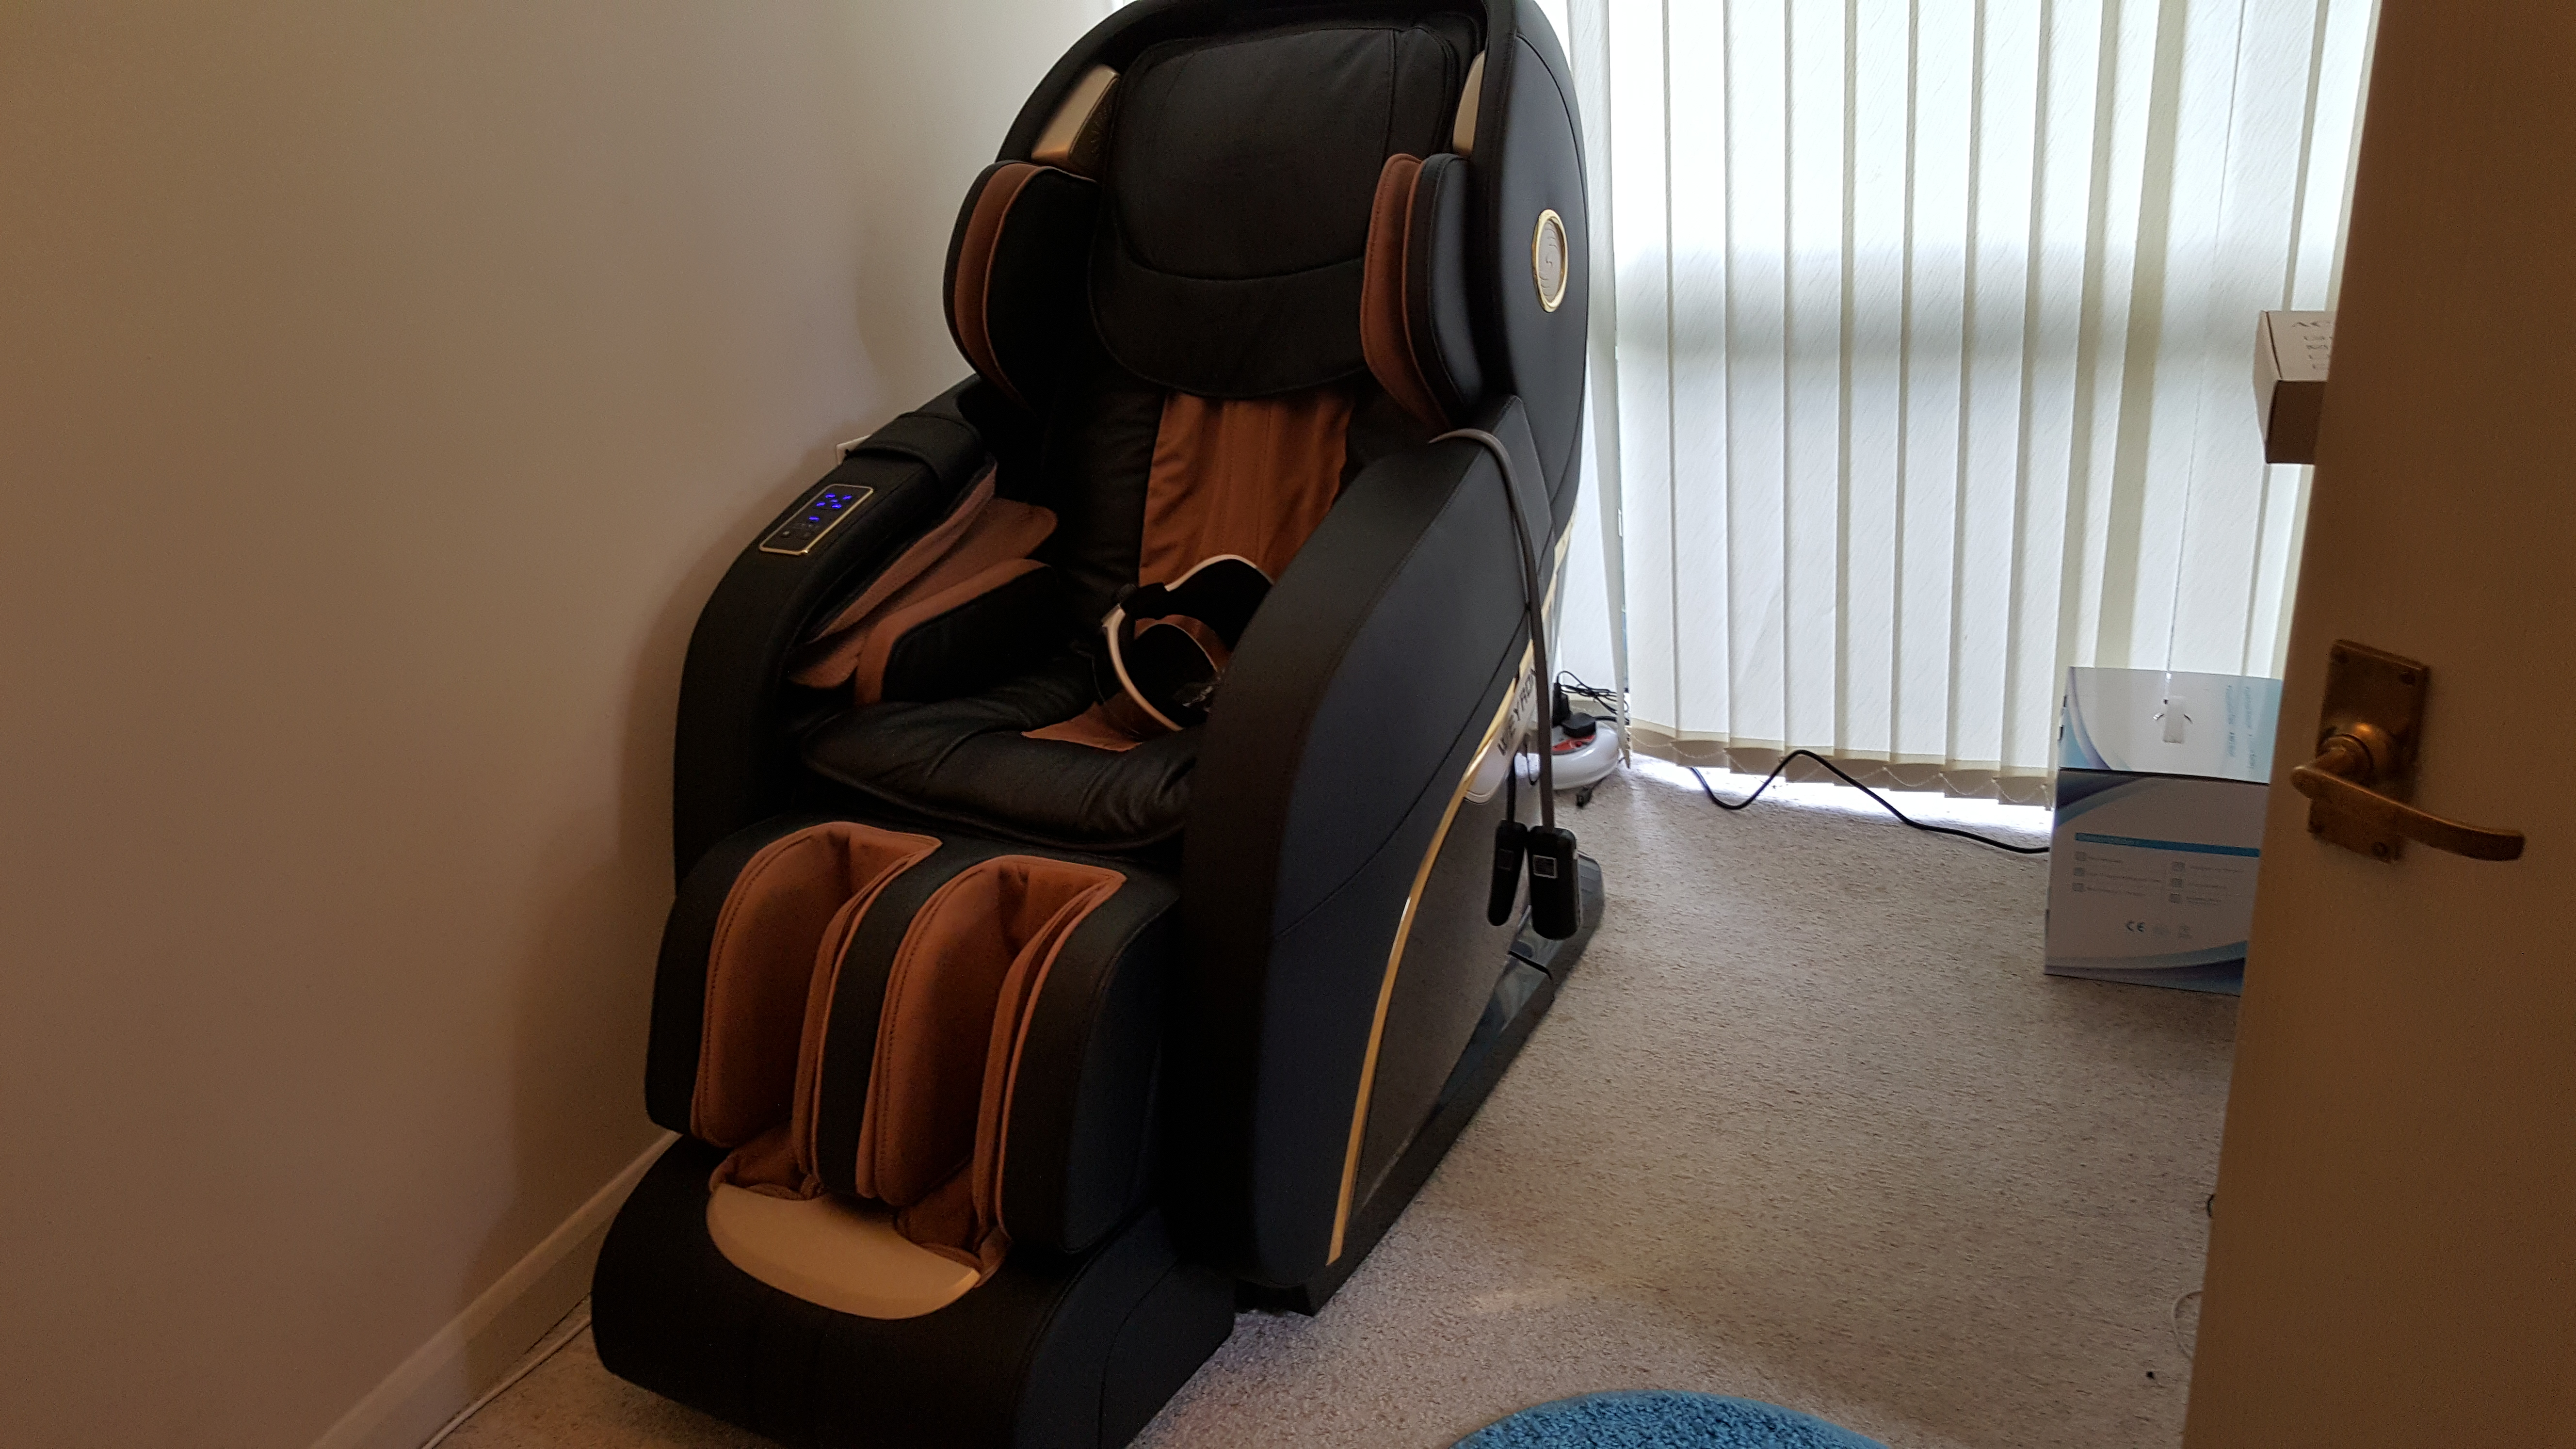 Massage Chair Best Massage Chair Weyron Oyster Massage Chair